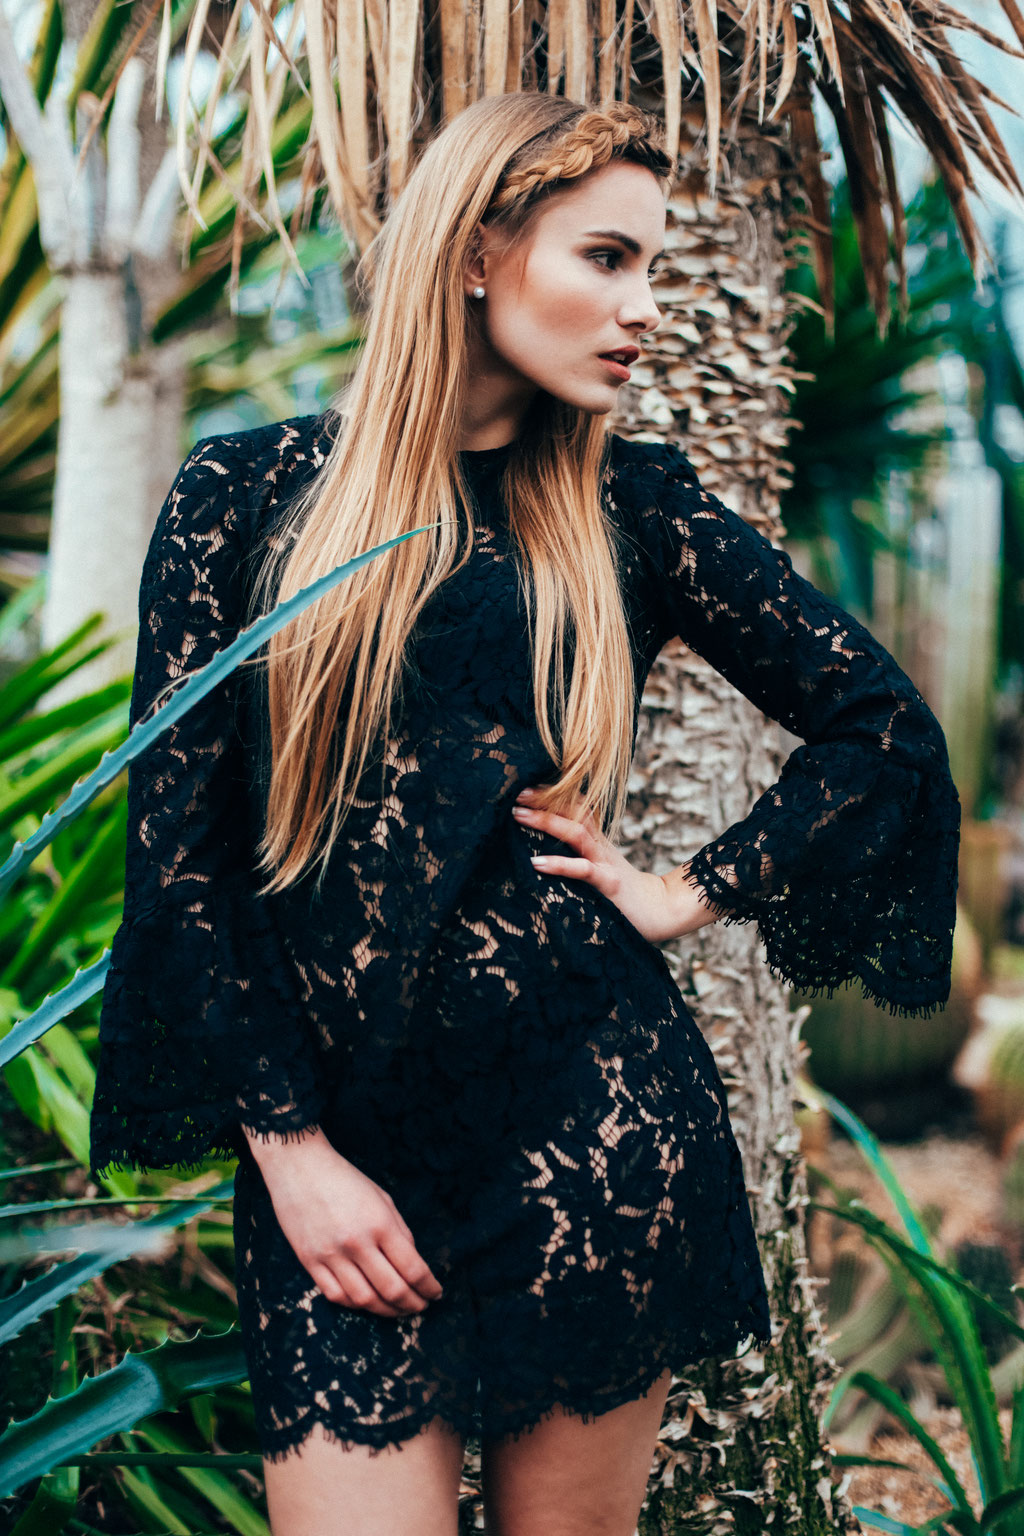 Photo: Bogatini Photographics // Model: Jina // Fashion: NA-KD